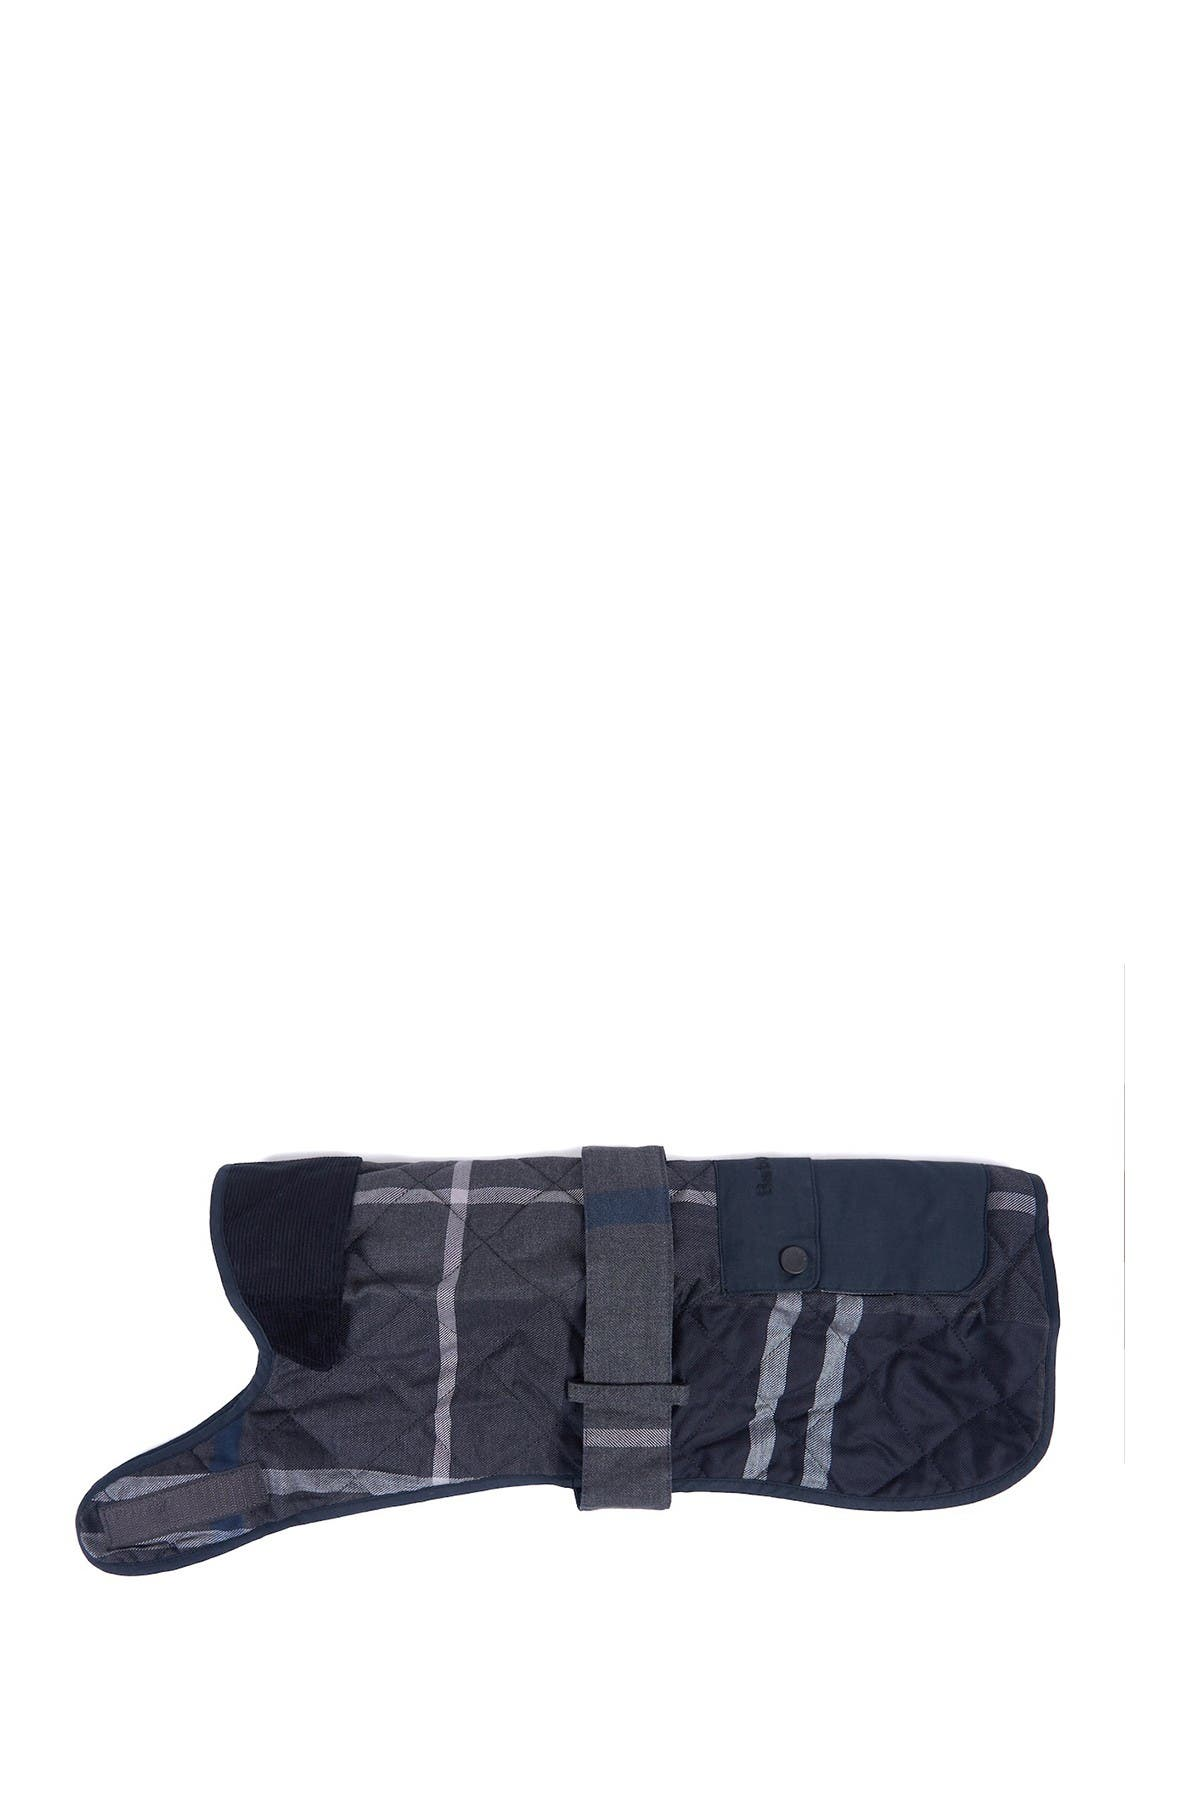 Image of Barbour Tartan Graphite Dog Coat